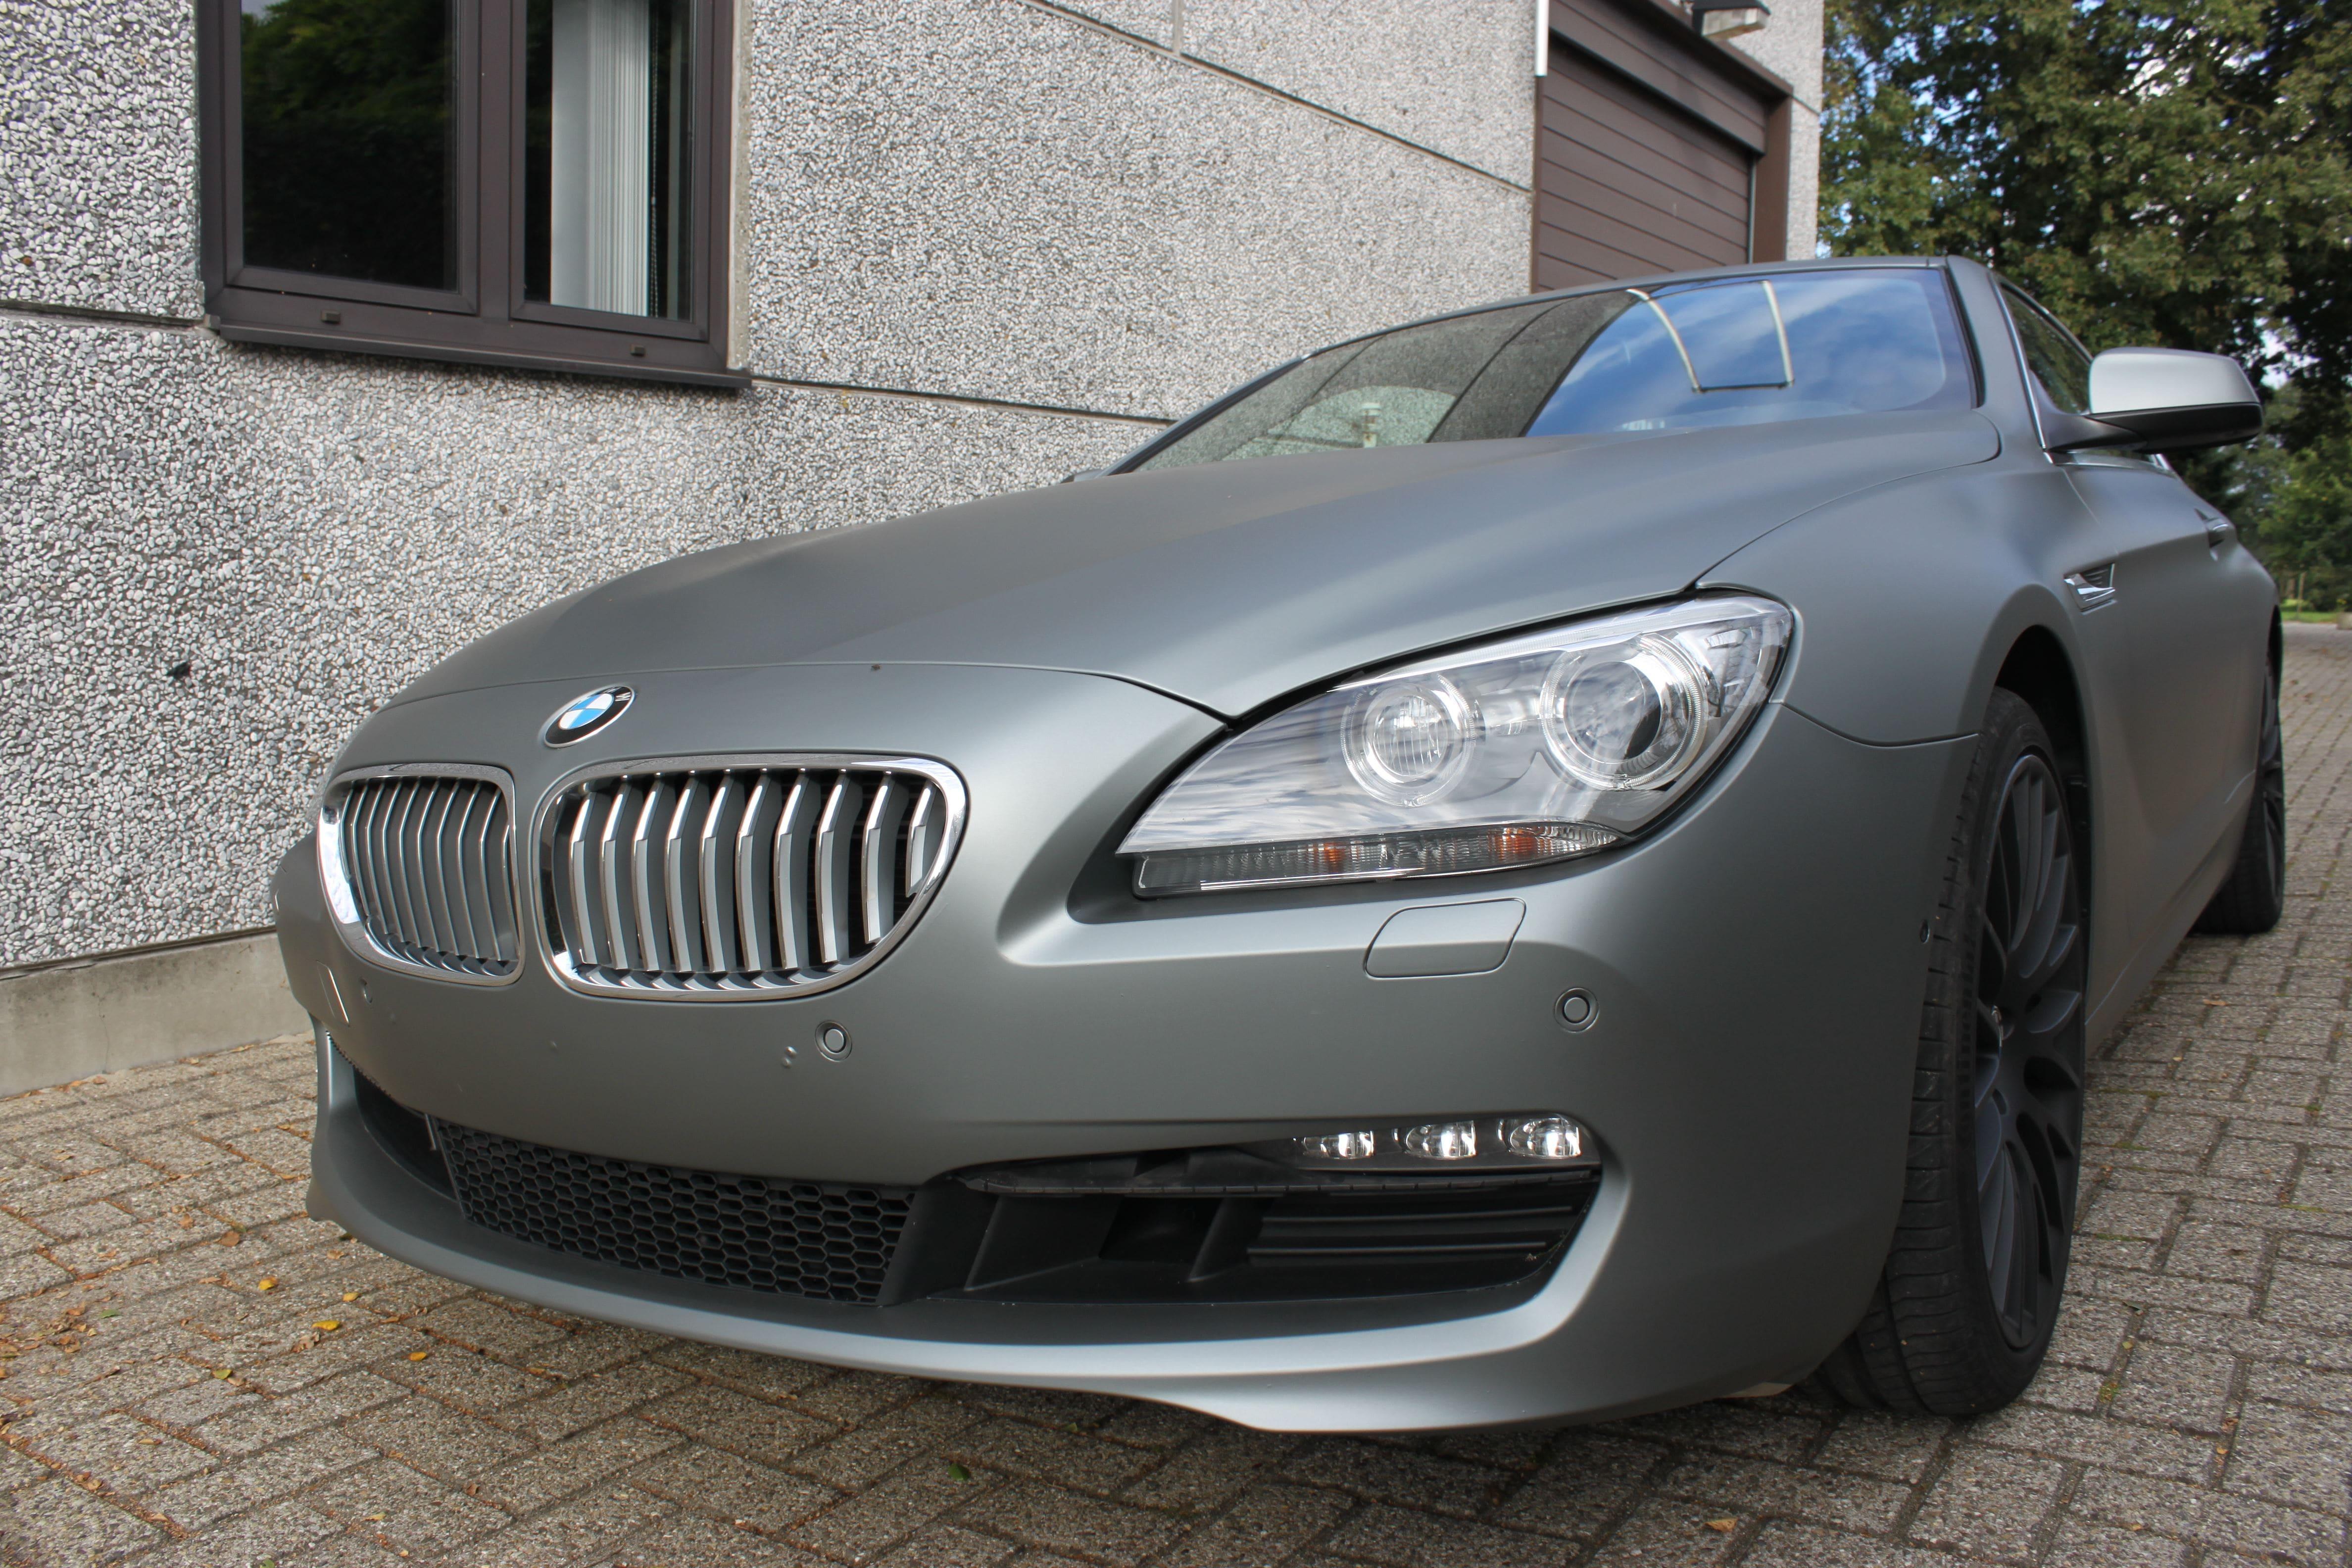 BMW 650i met Mat Antraciet Metallic Avery Wrap, Carwrapping door Wrapmyride.nu Foto-nr:5281, ©2020